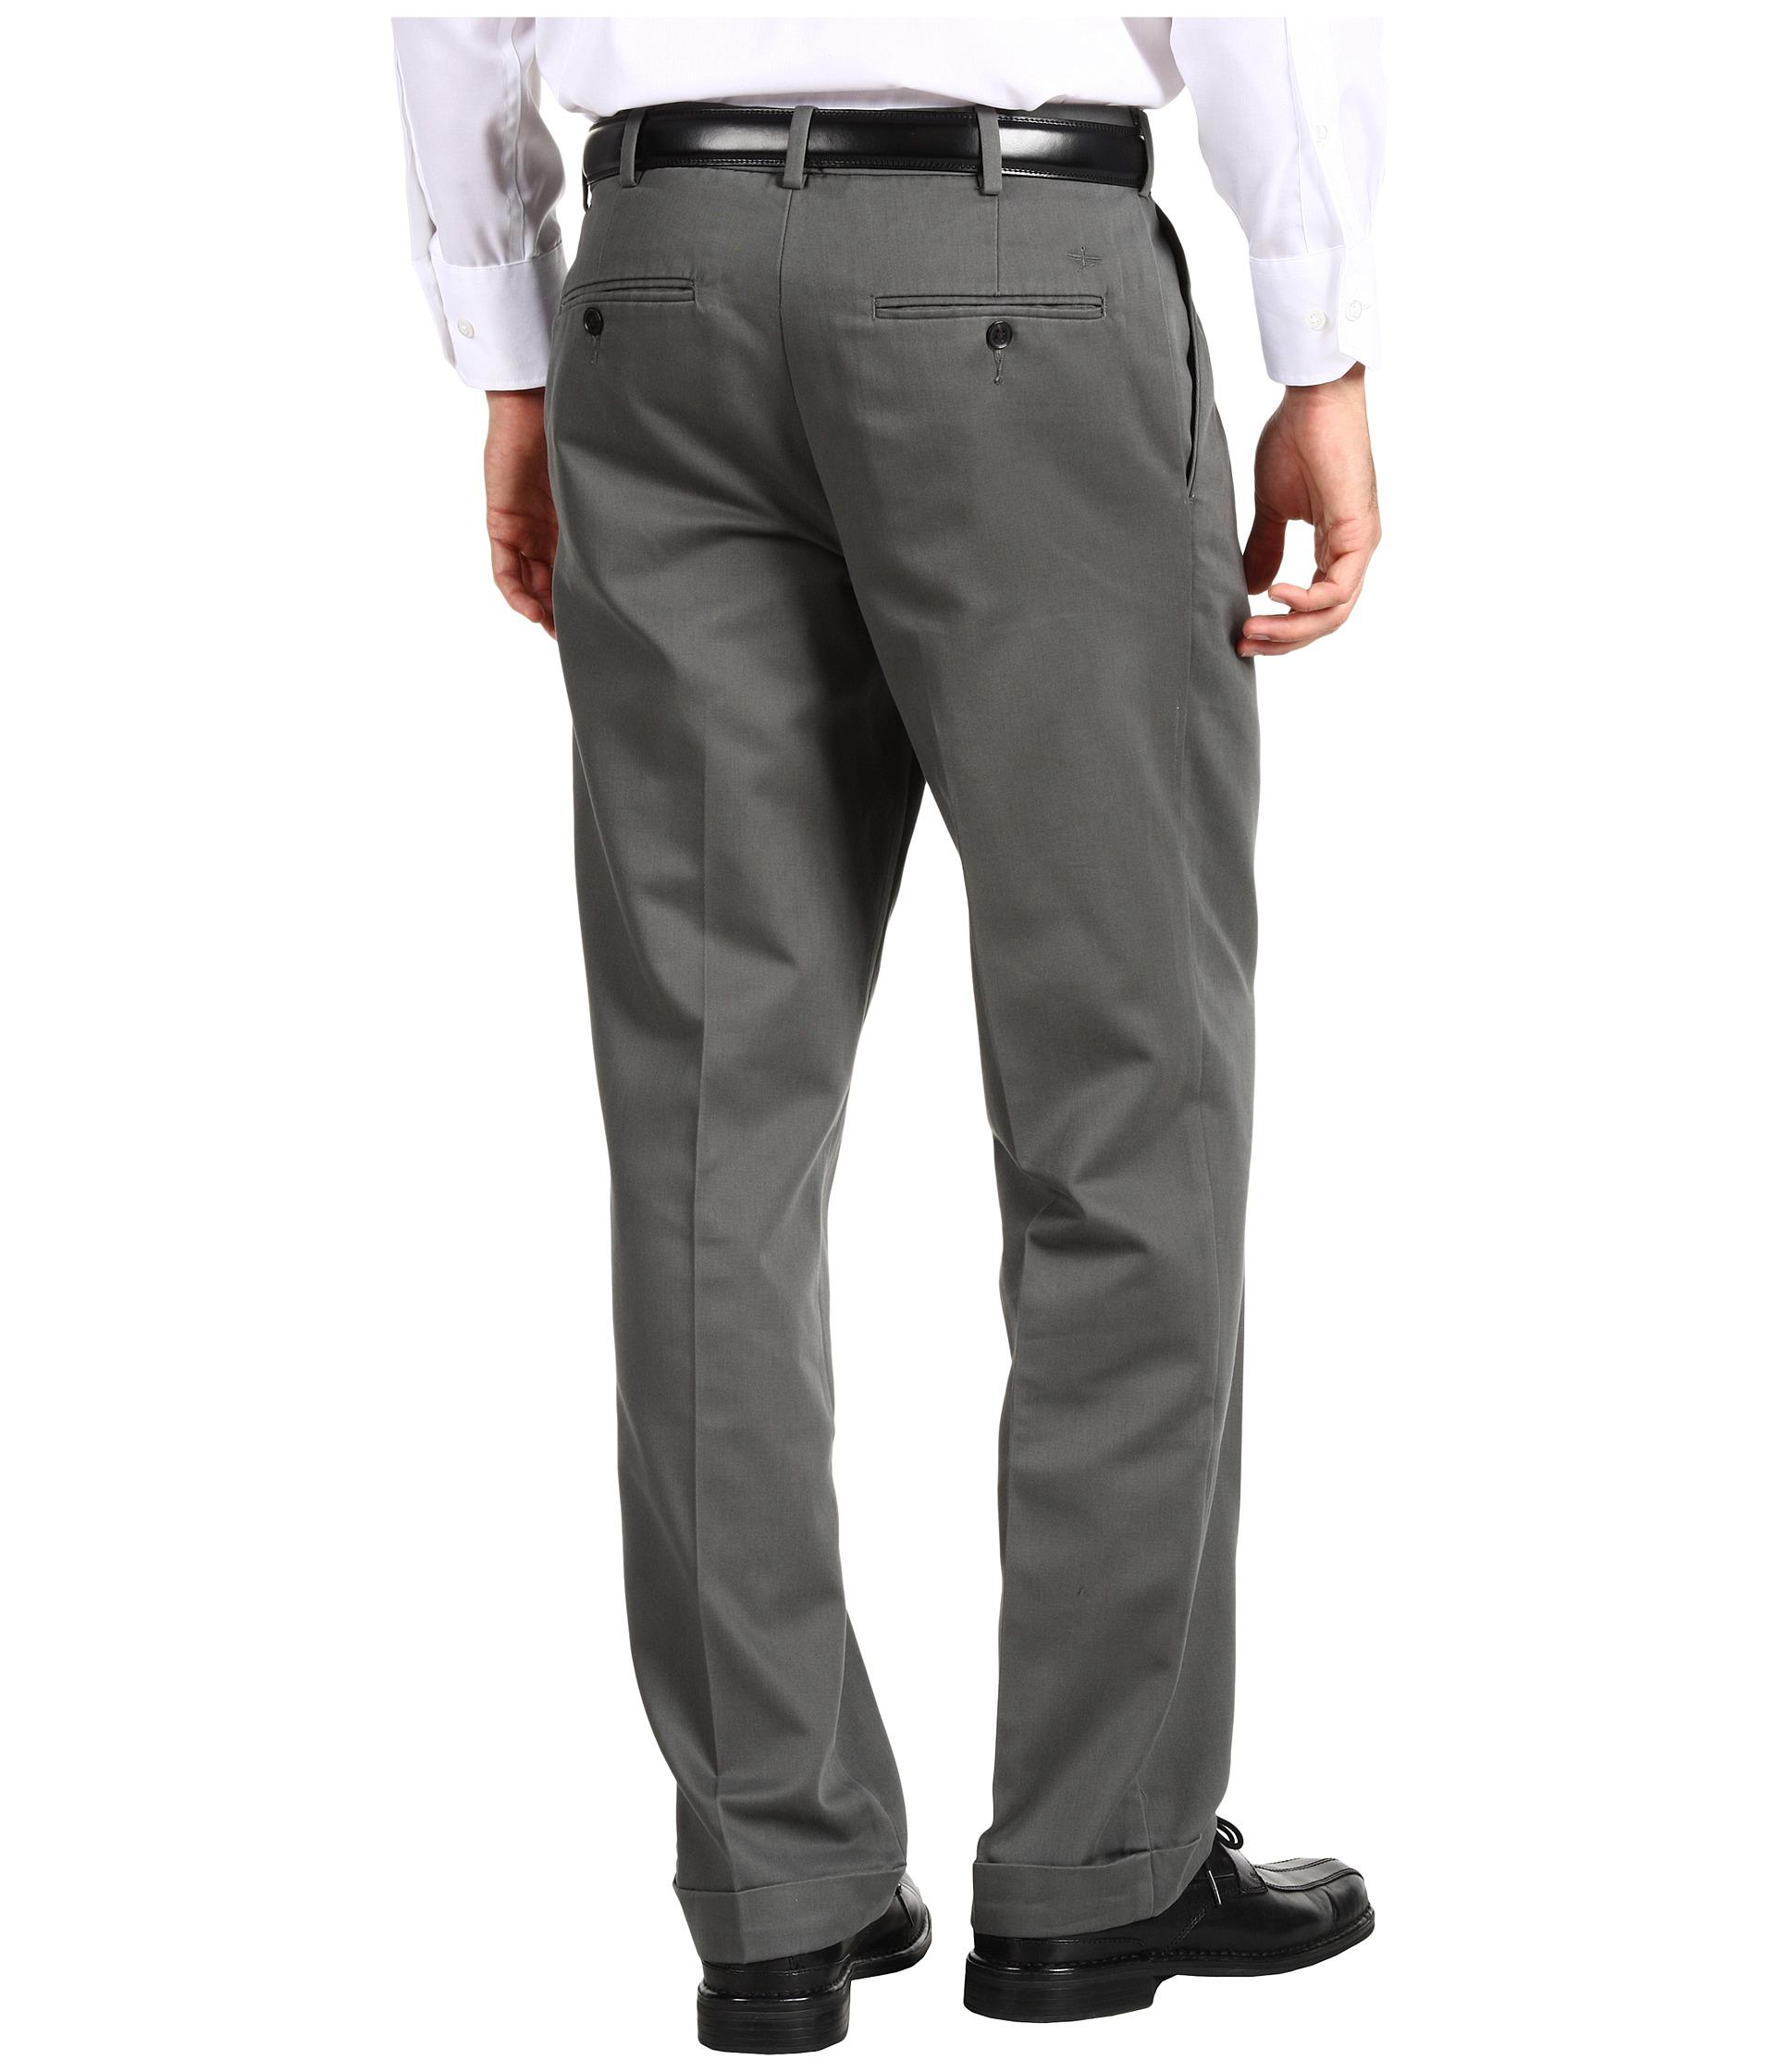 lyst vintage comforter super double jeans liverpool stretch fairhaven skirt comfort clothing waist in denim company hem